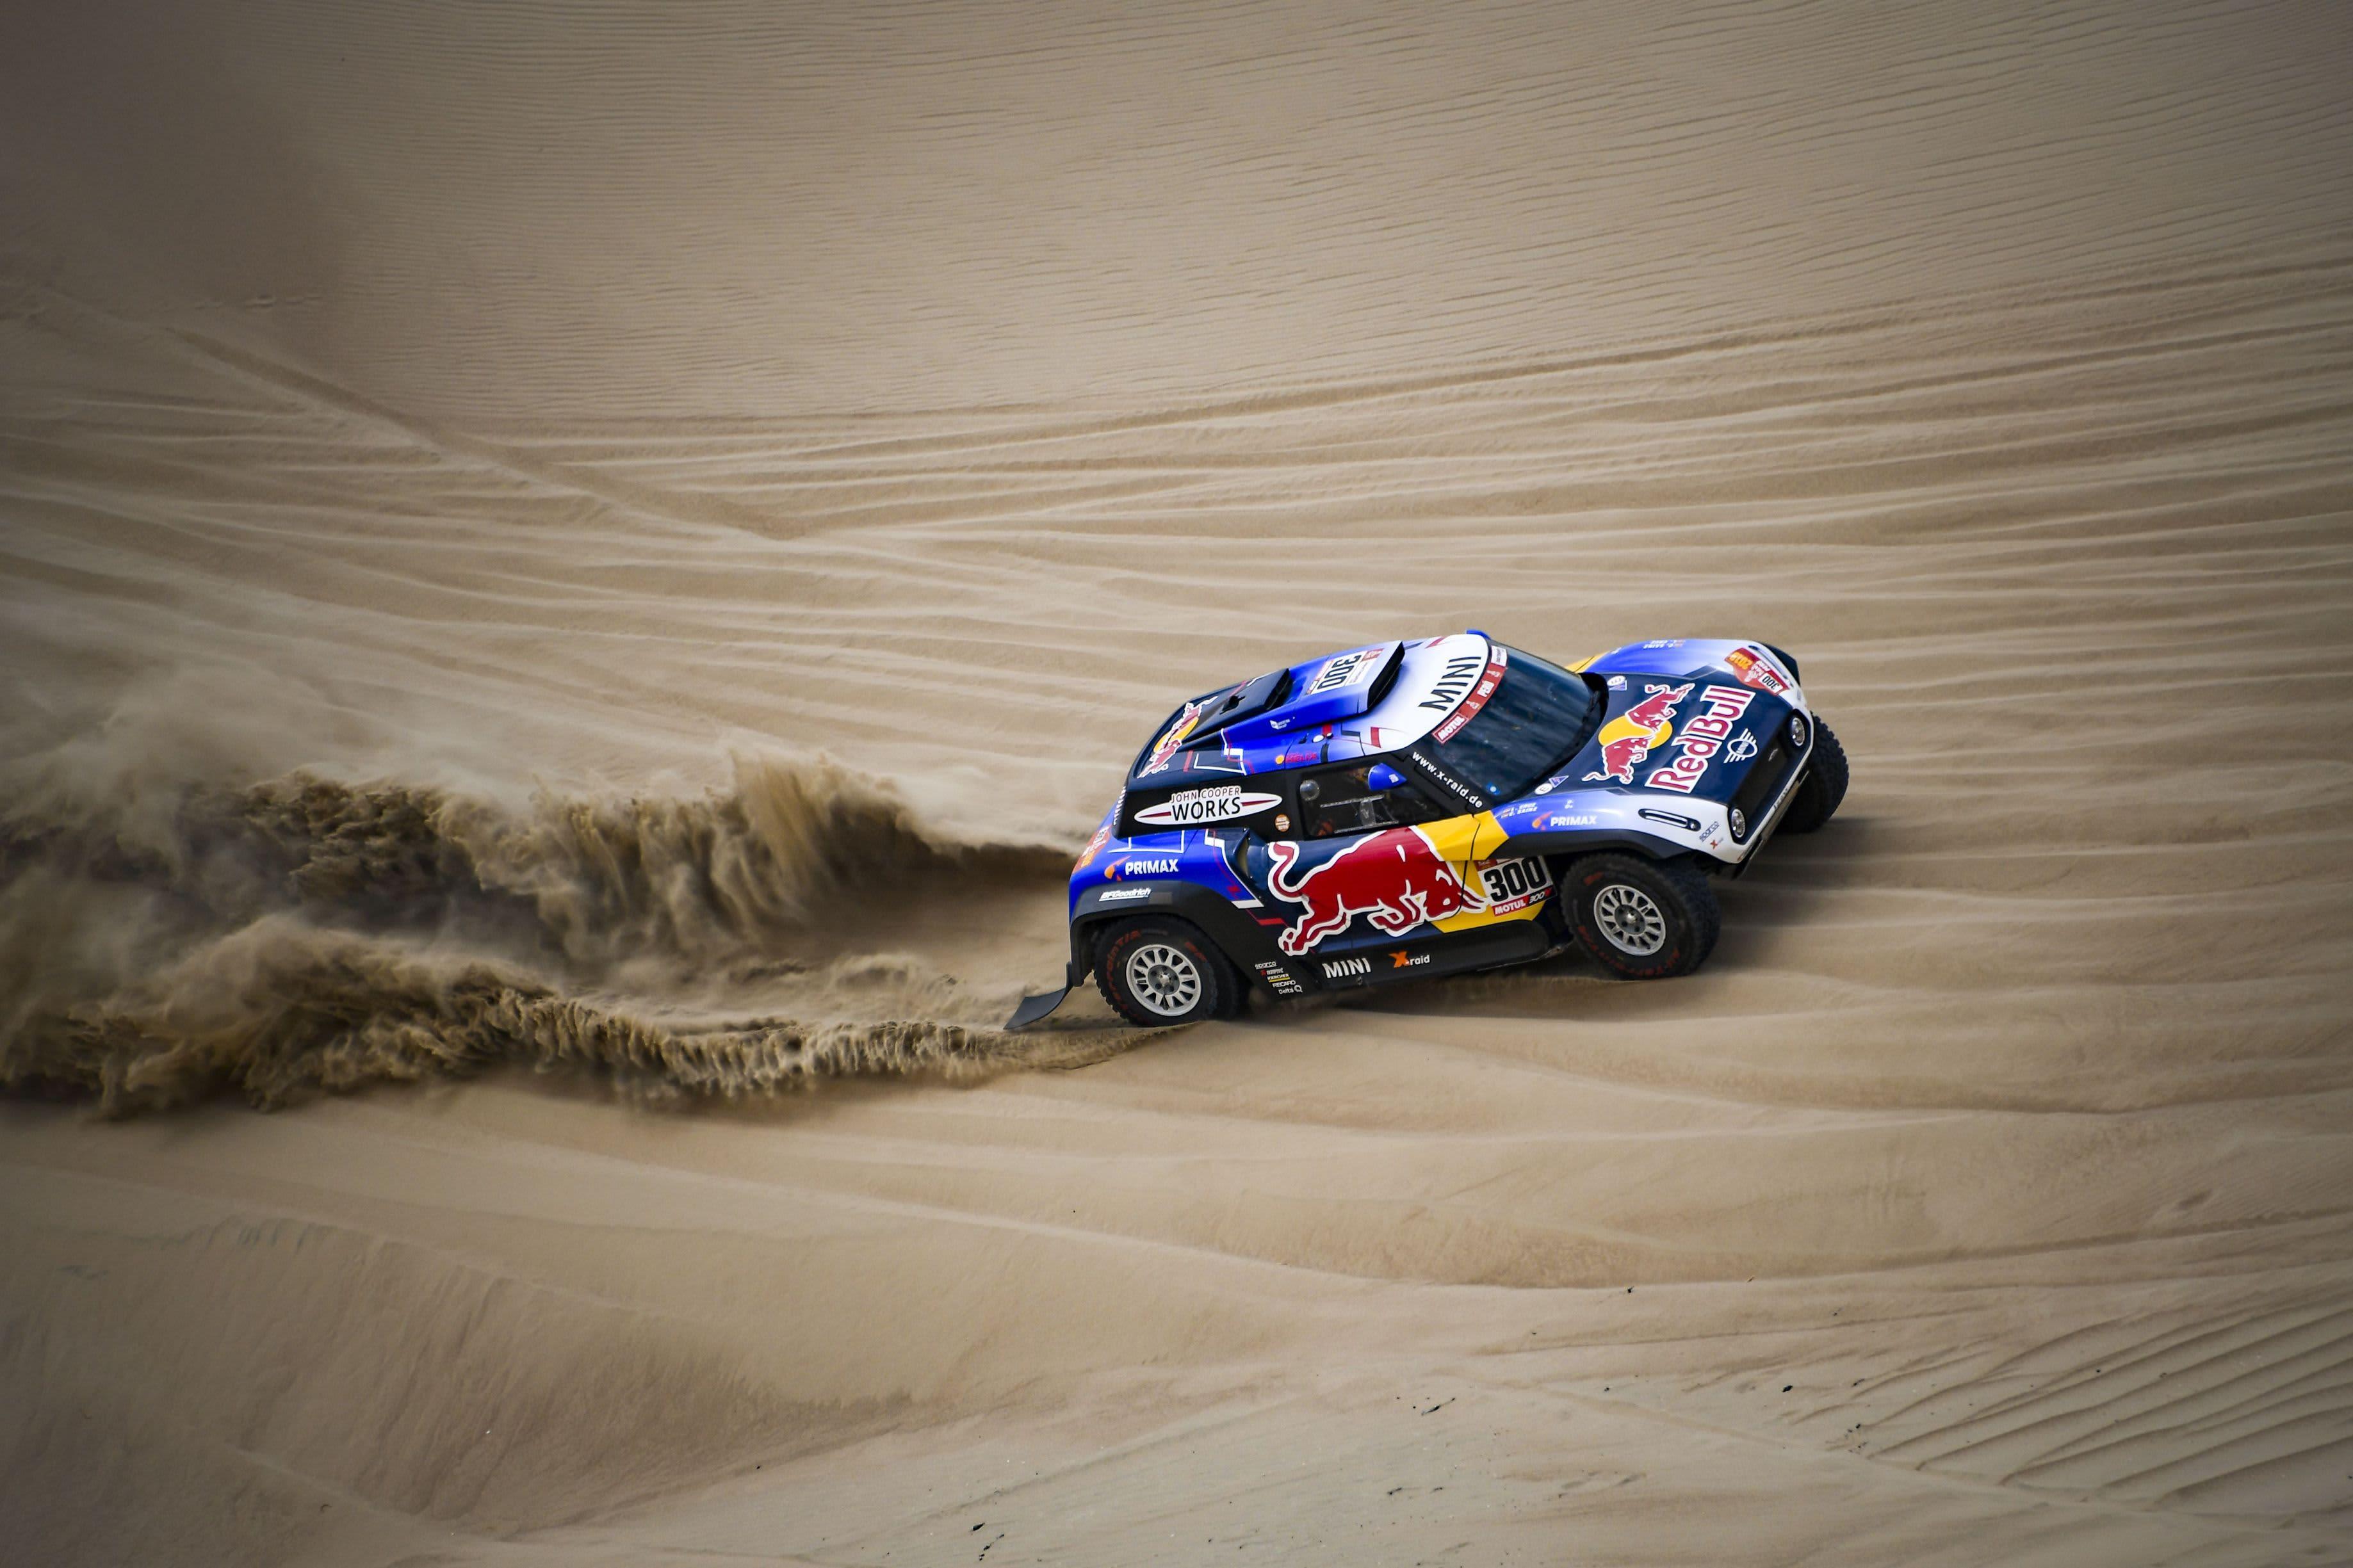 Carlos Sainz ajaa aavikolla.